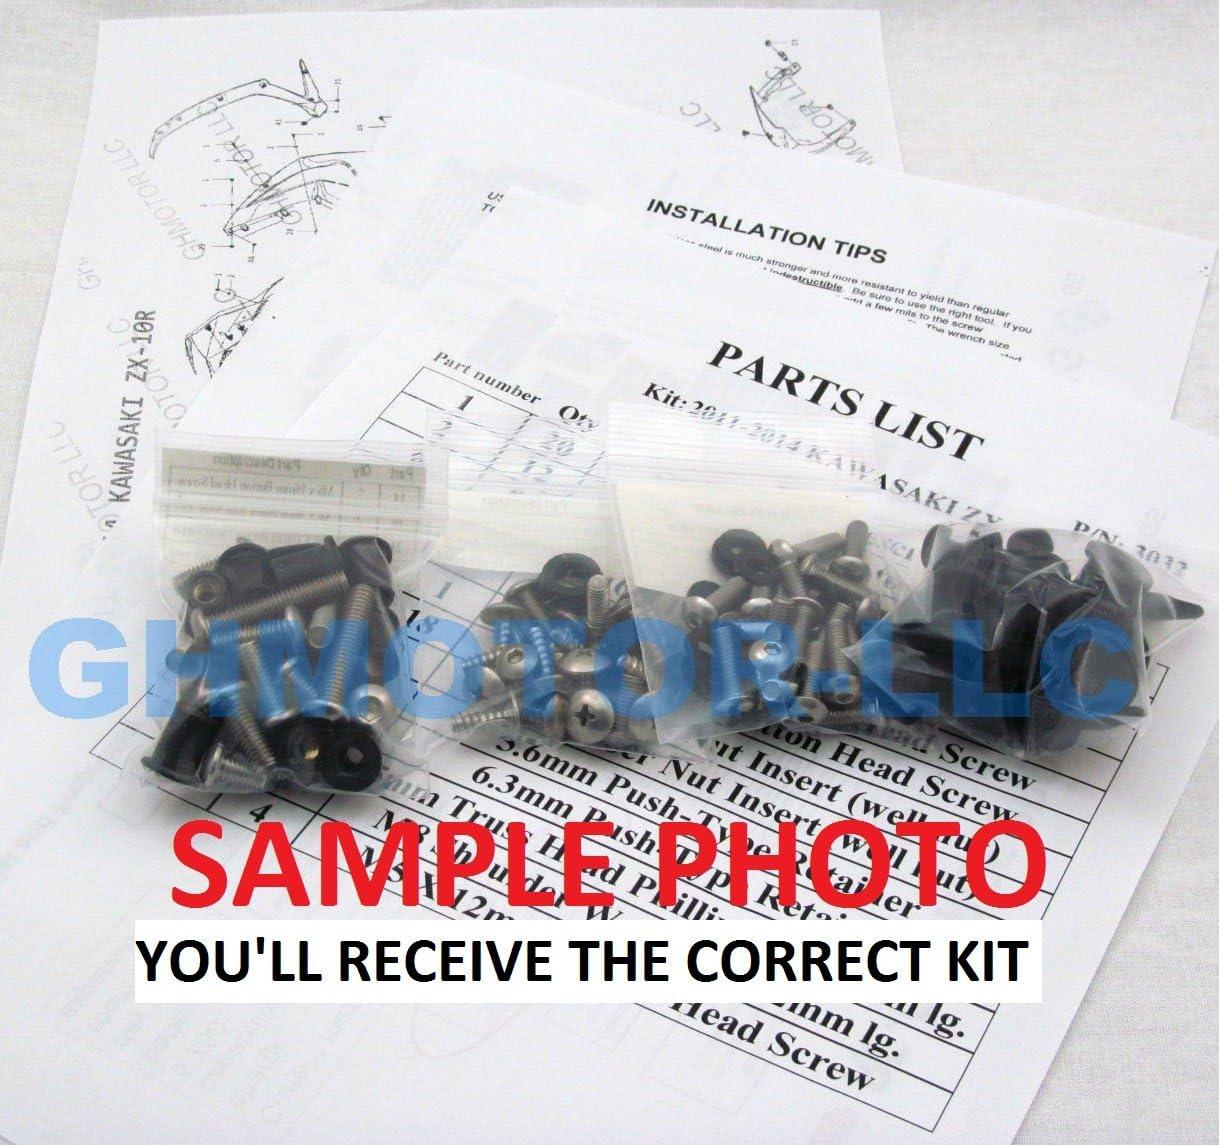 2007 2008 2009 2010 2011 DUCATI 848 1098 1198 2011 2012 2013 848 EVO Complete Fairings Screw Set MADE IN THE USA